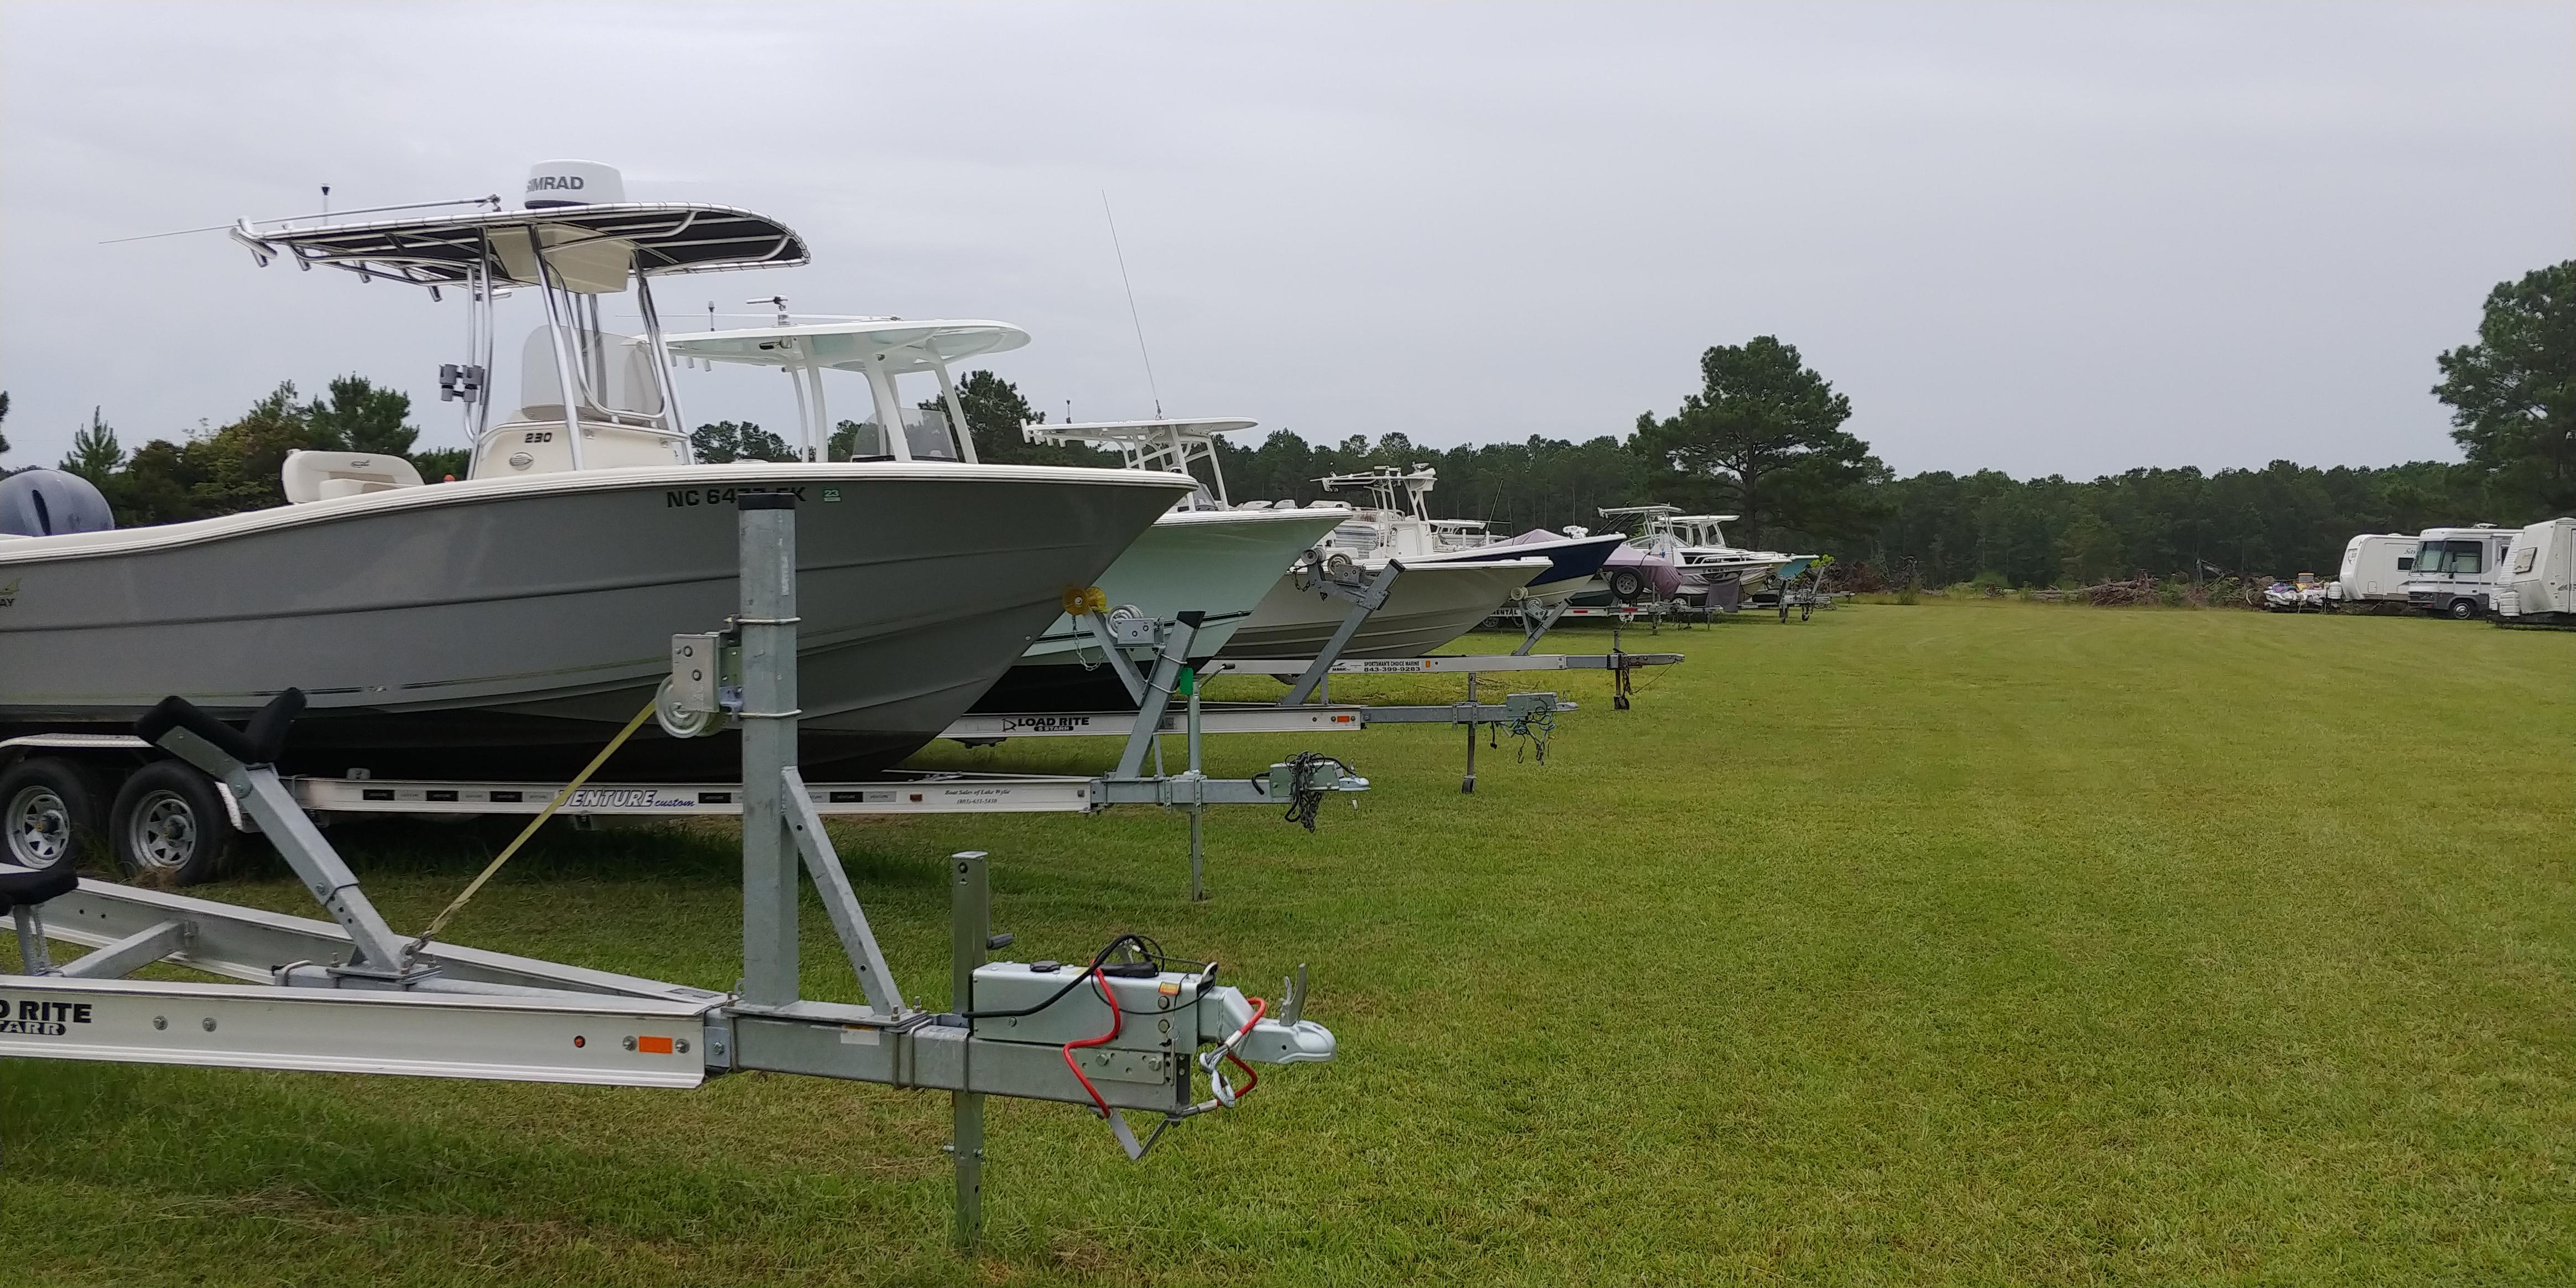 Boat, RV, and Trailer parking in Ocean Isle Beach, NC